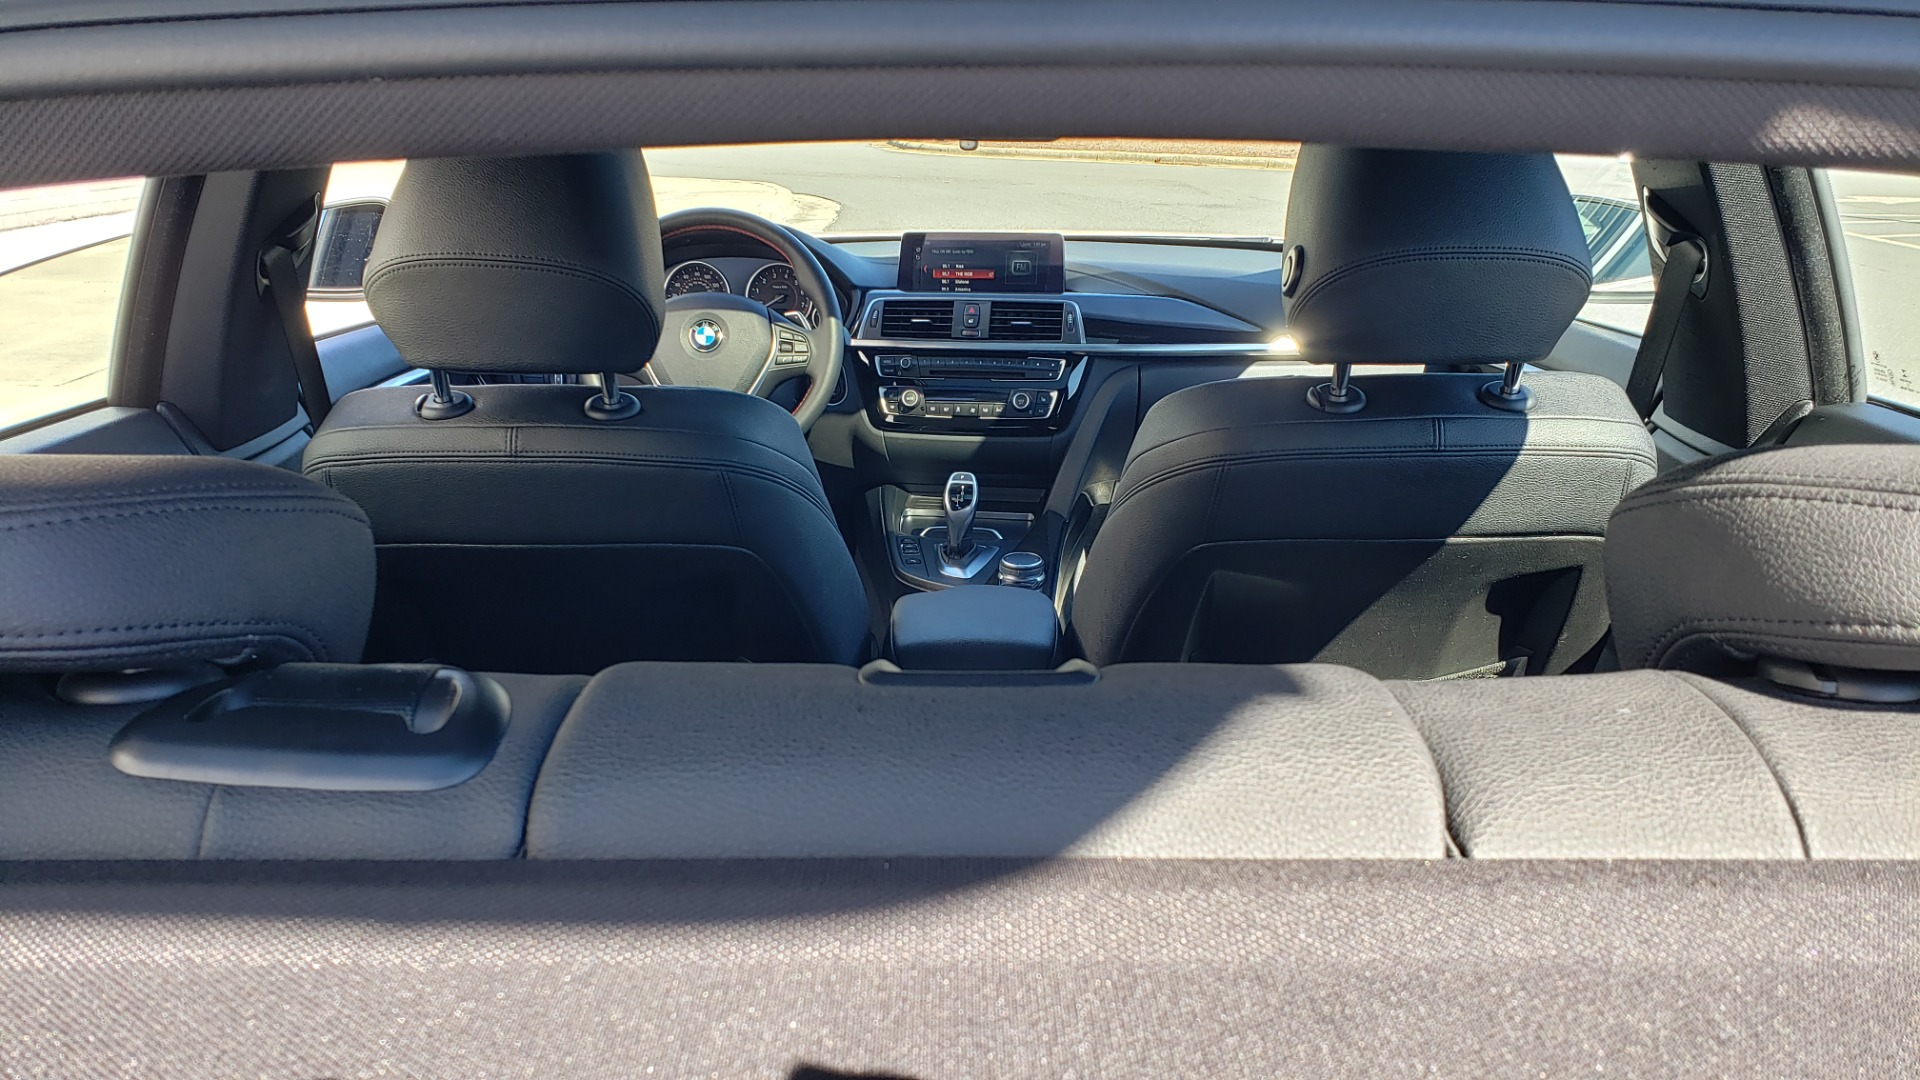 Used 2018 BMW 4 SERIES 430IXDRIVE / PREMIUM / NAV / SUNROOF / ESSENTIALS PKG for sale $28,995 at Formula Imports in Charlotte NC 28227 18